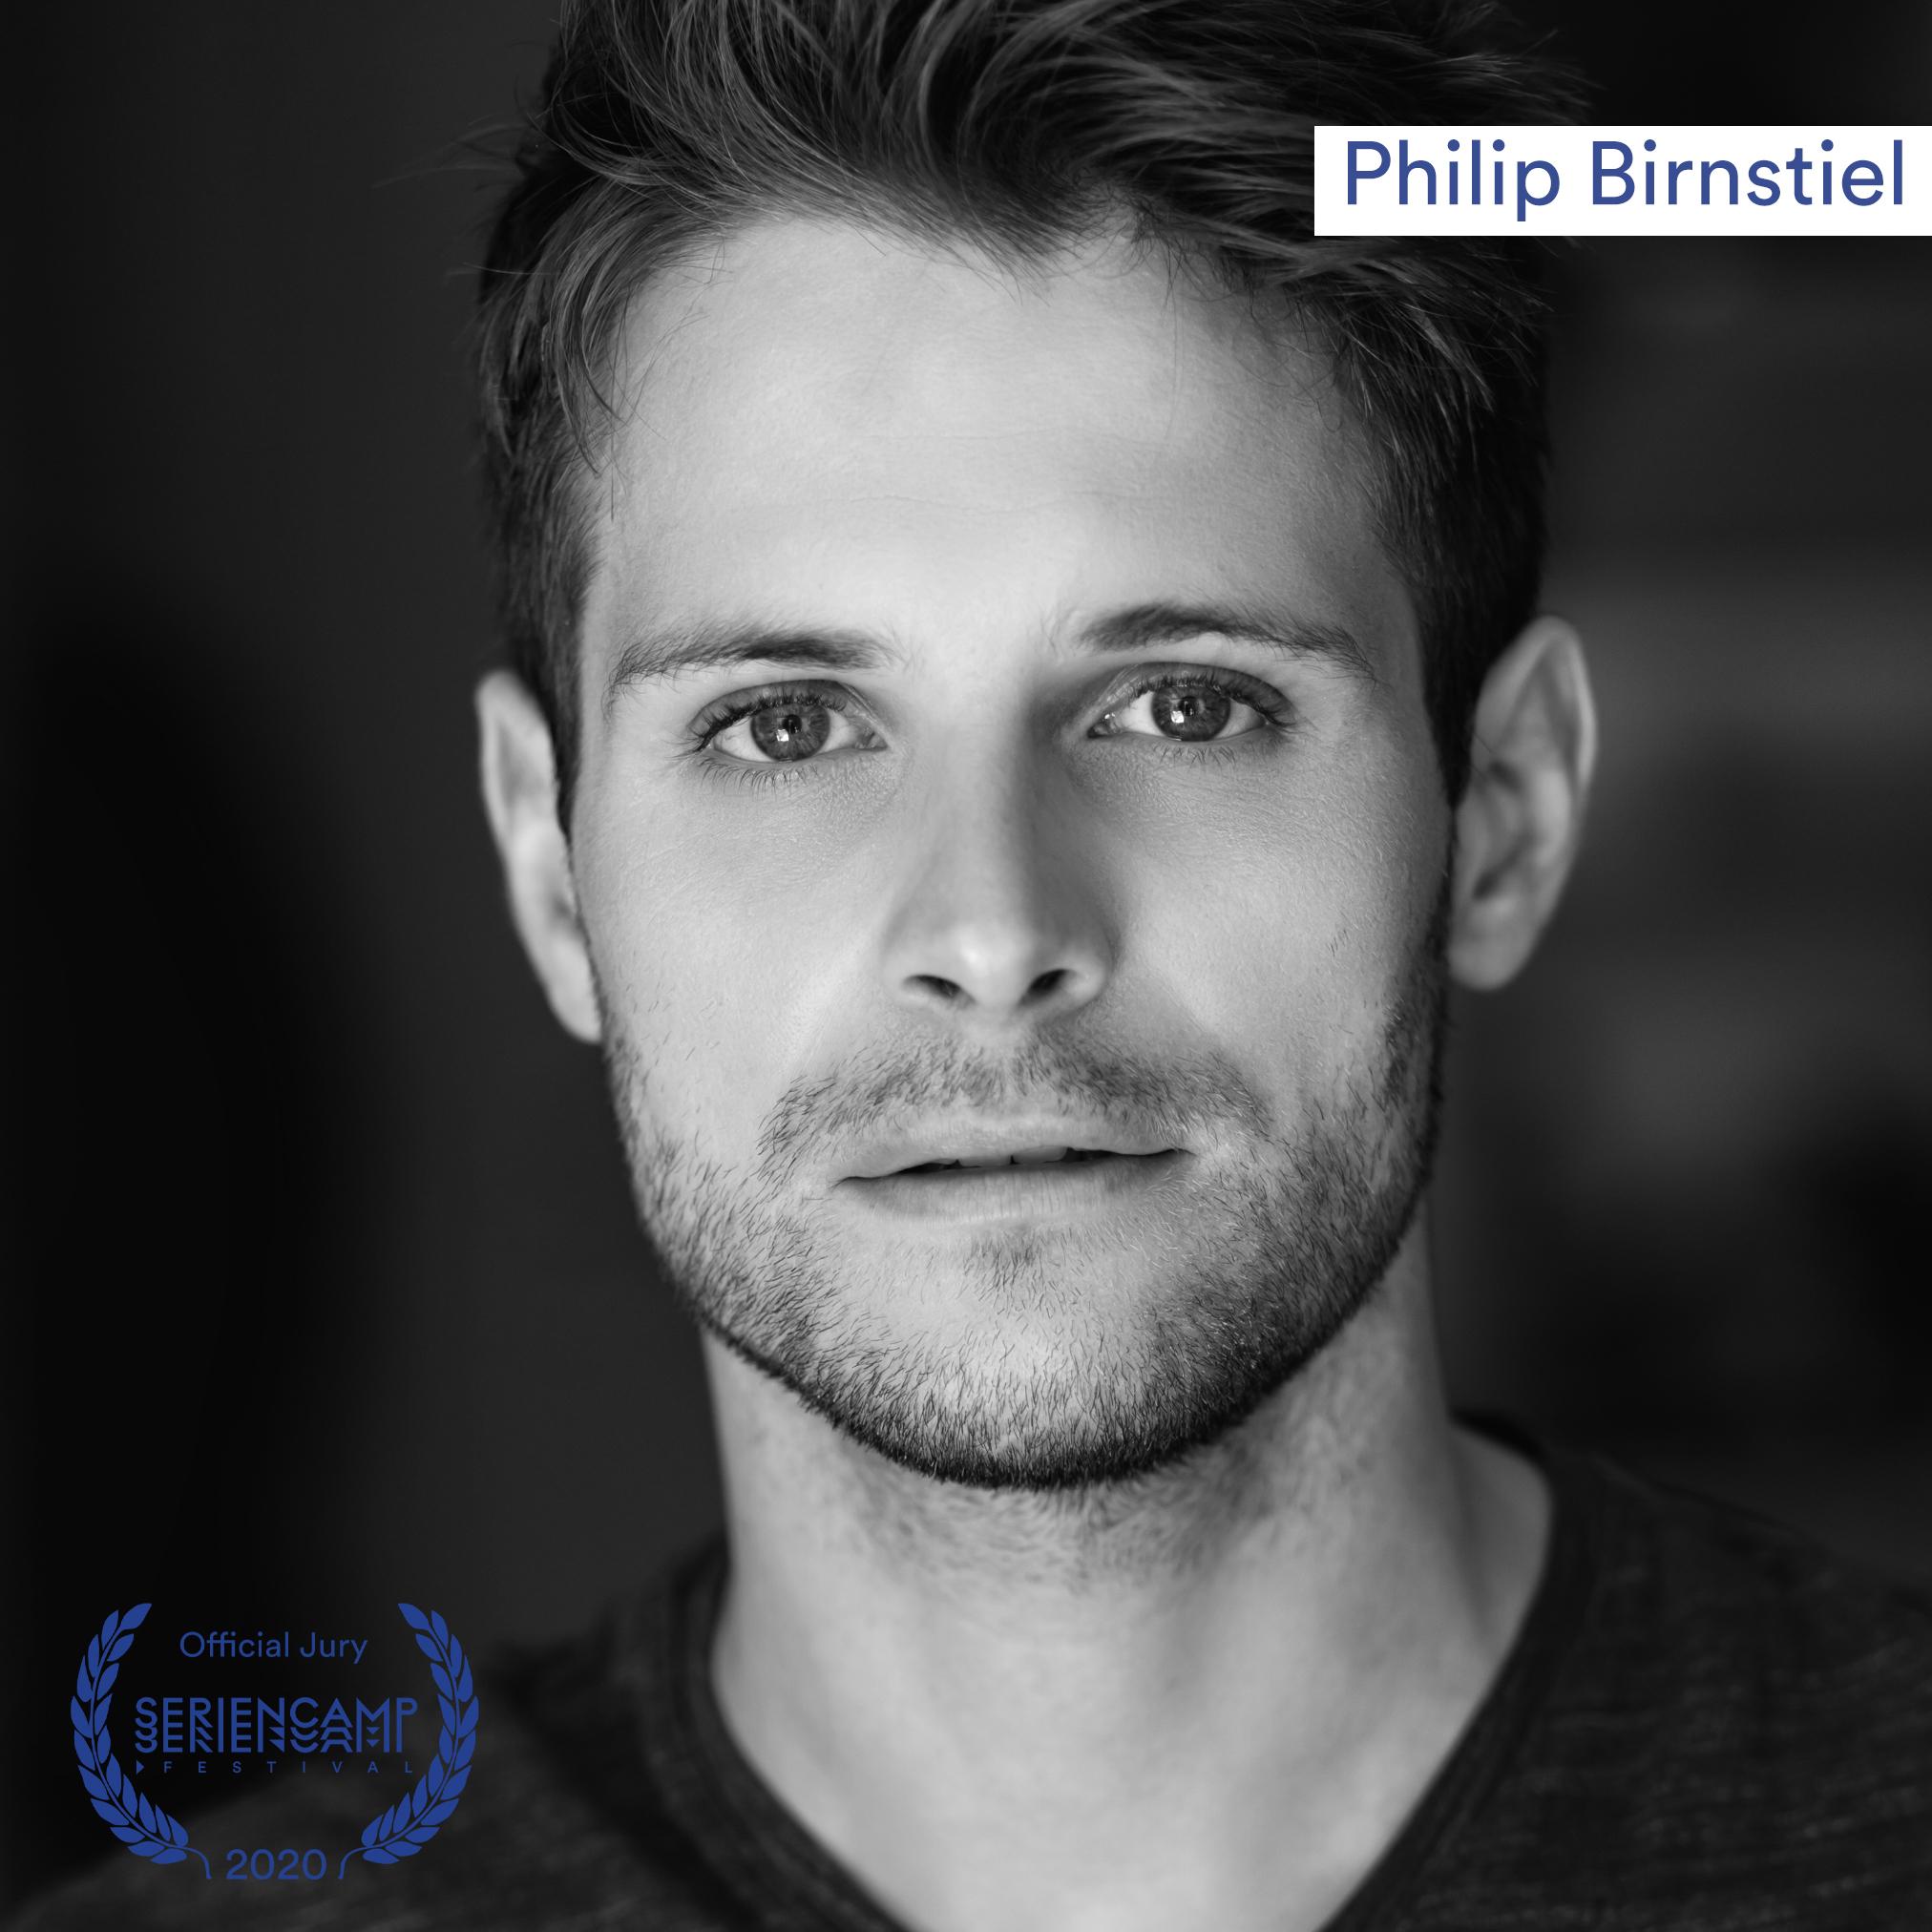 Official Competition 2020: Philip Birnstiel